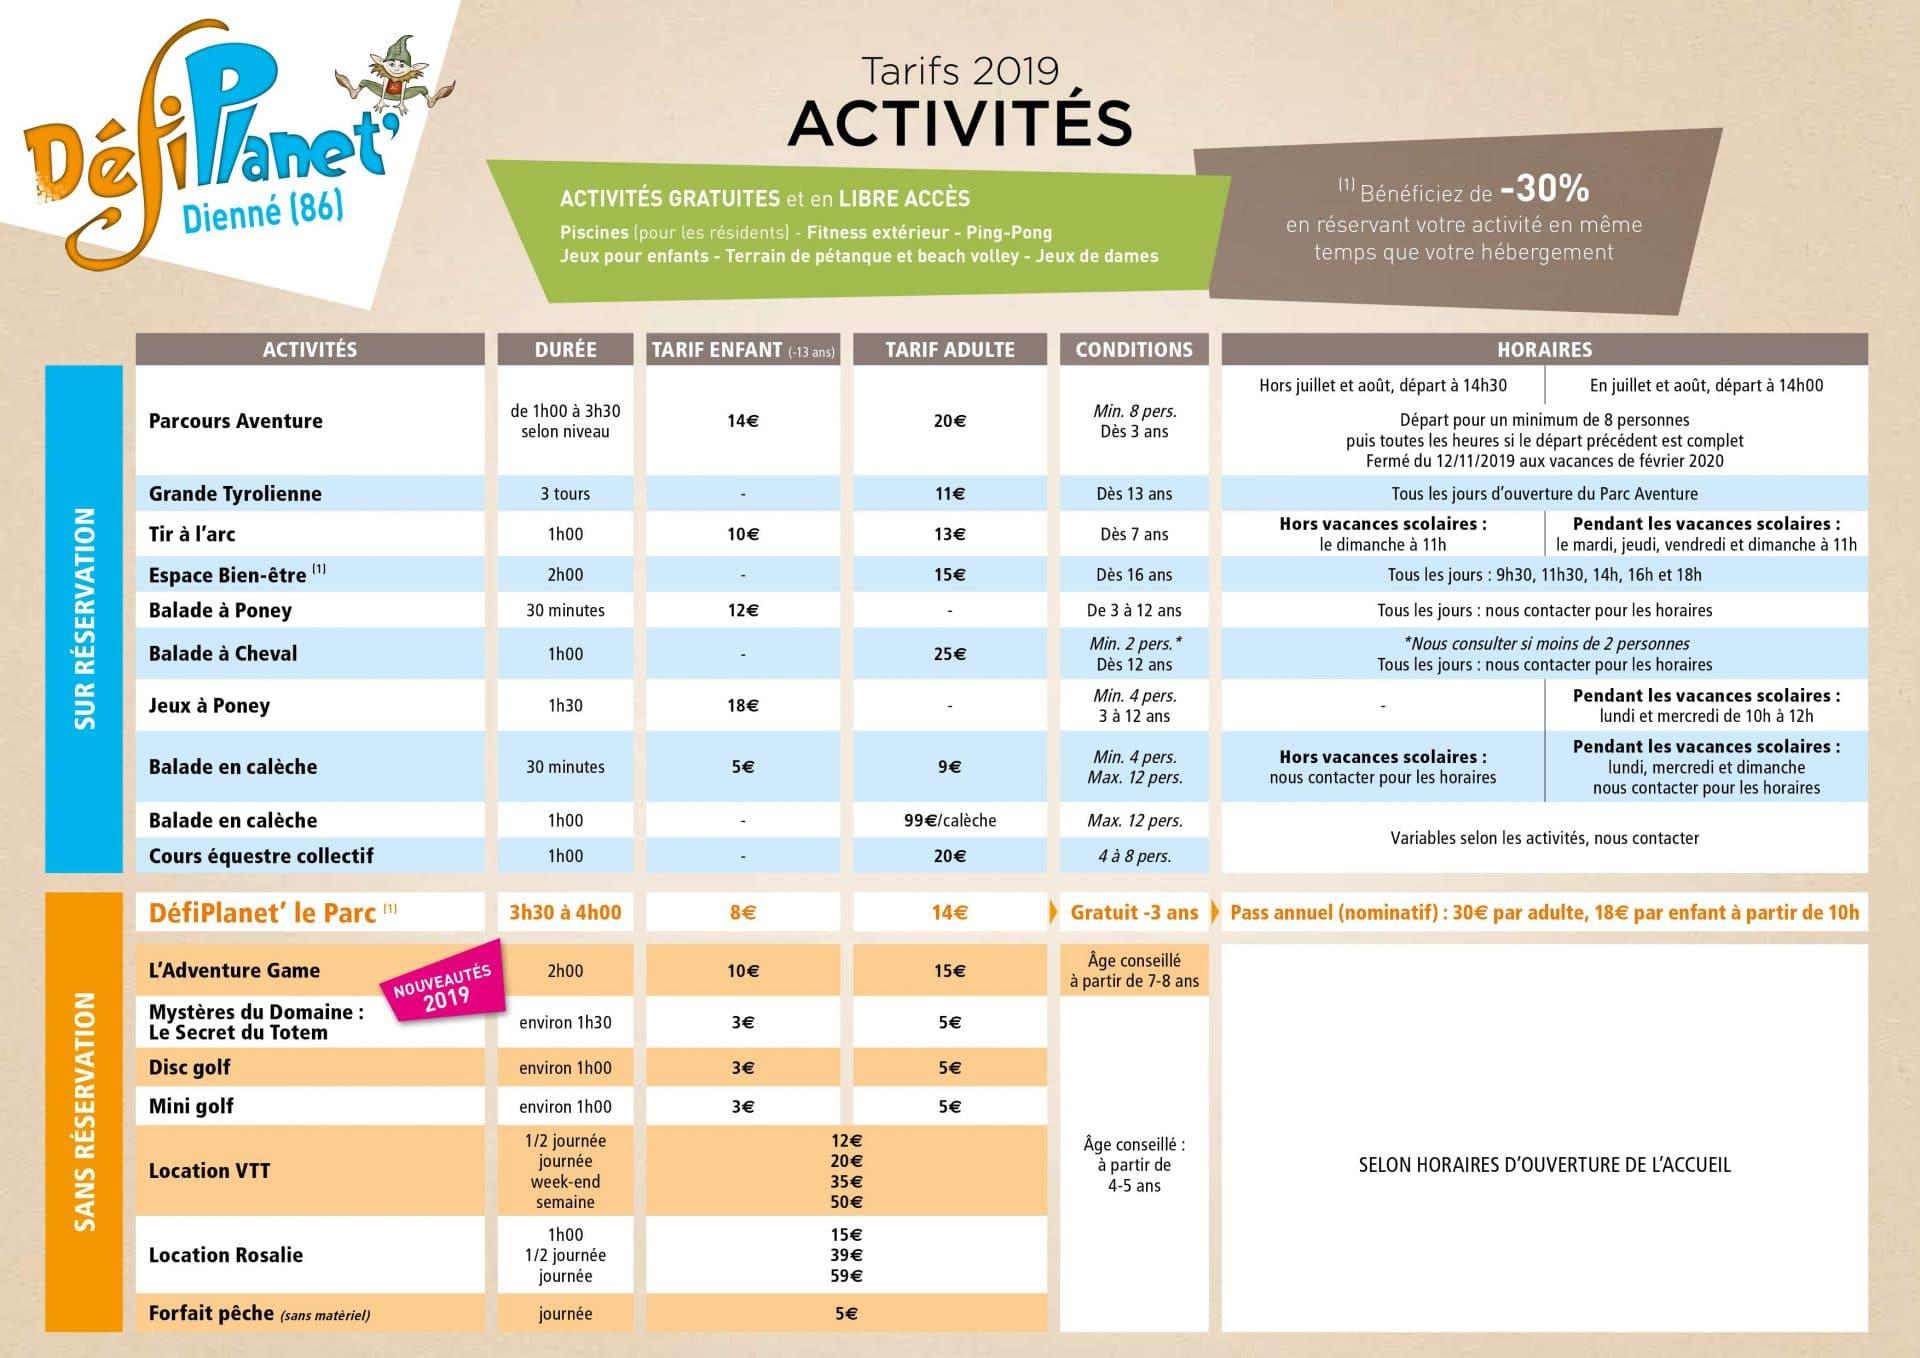 Tarifs activités 2019